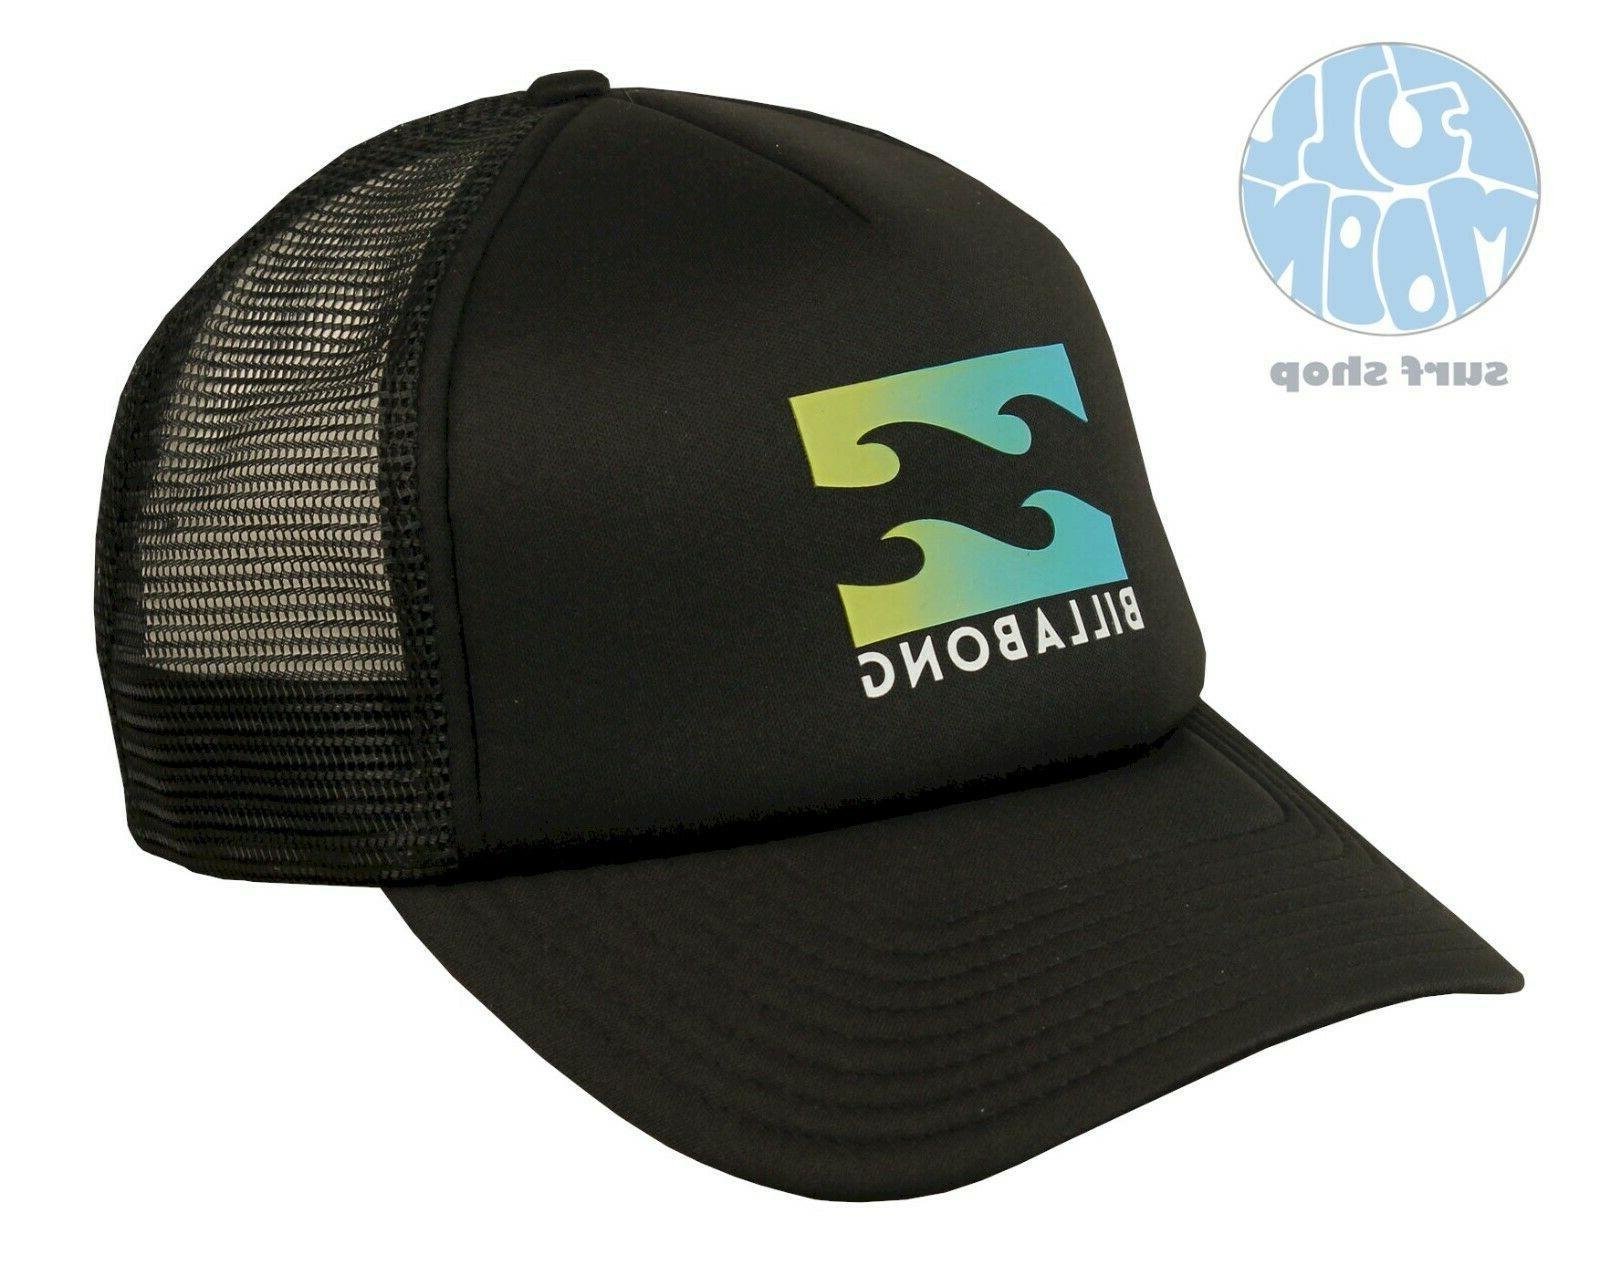 New Blue Yellow Black Snapback Hat